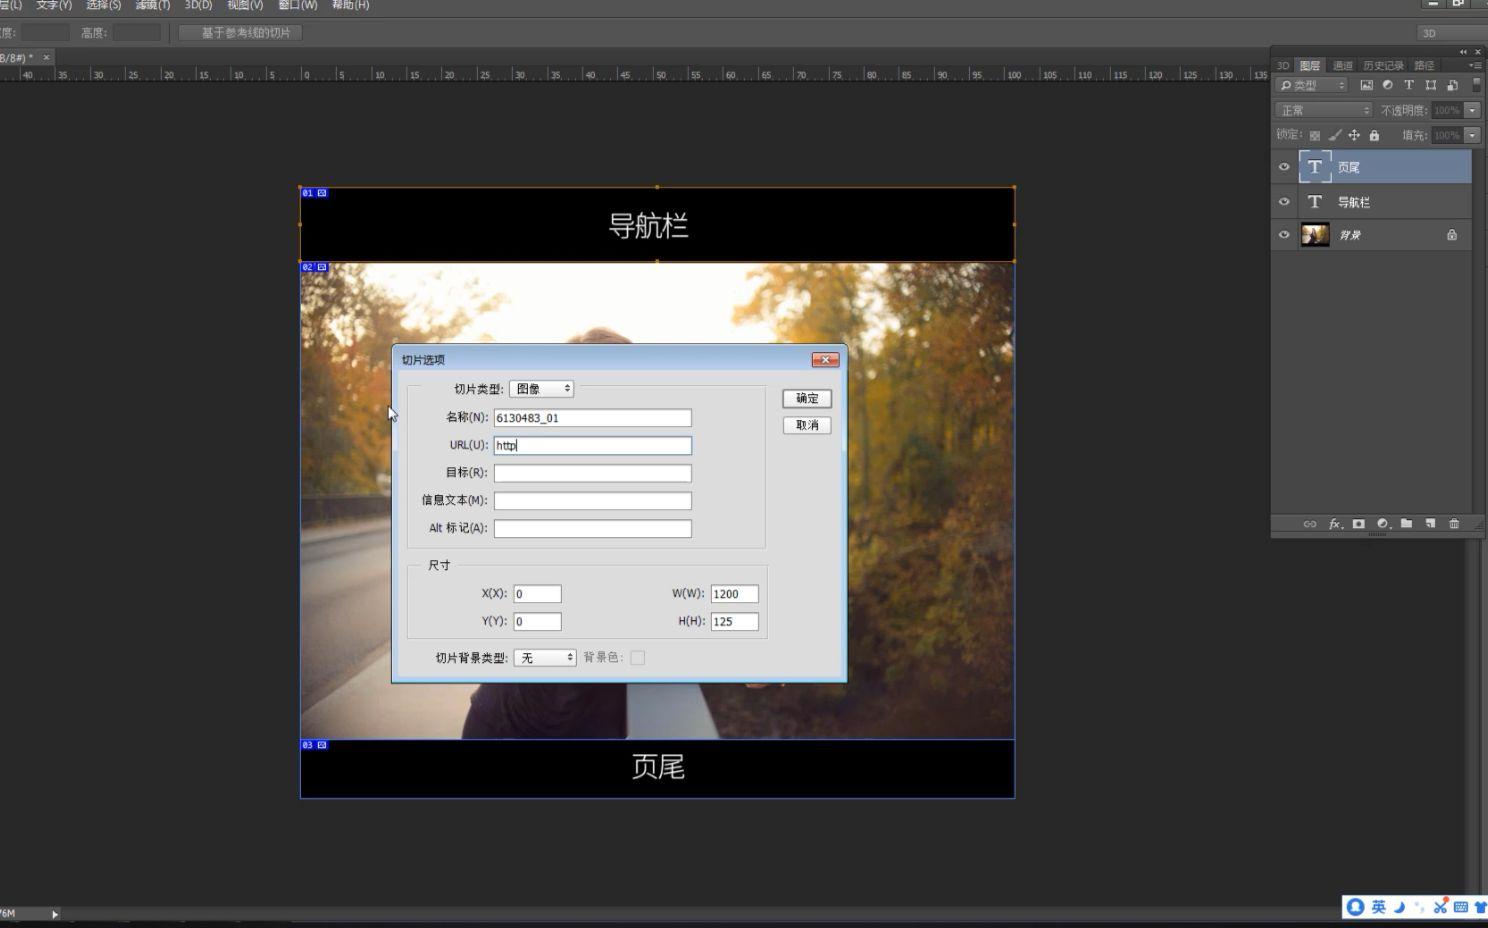 PS教程 photoshop教你如何使用切片工具_嗶哩嗶哩 (゜-゜)つロ 干杯~-bilibili